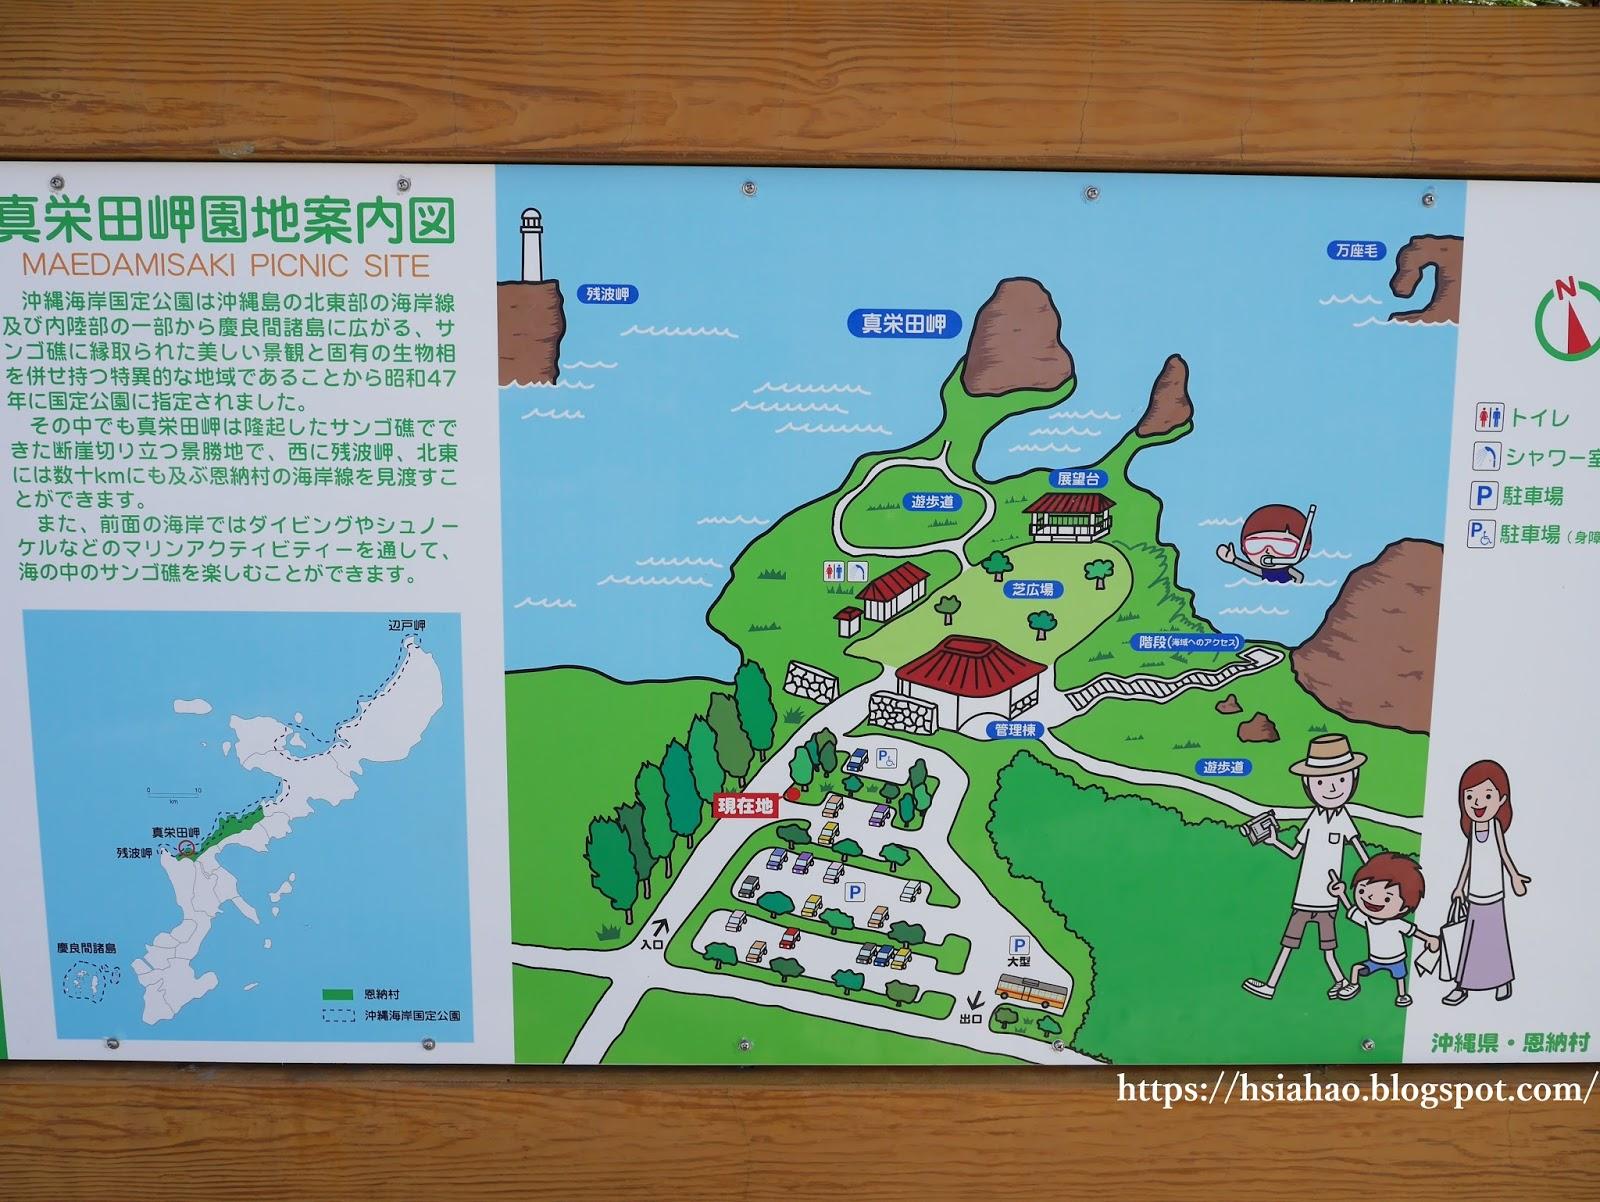 沖繩-景點-推薦-真榮田岬-青之洞窟-地圖-潛水-浮潛-青の洞窟-自由行-旅遊-Okinawa-diving-snorkeling-maeda-cape-blue-cave